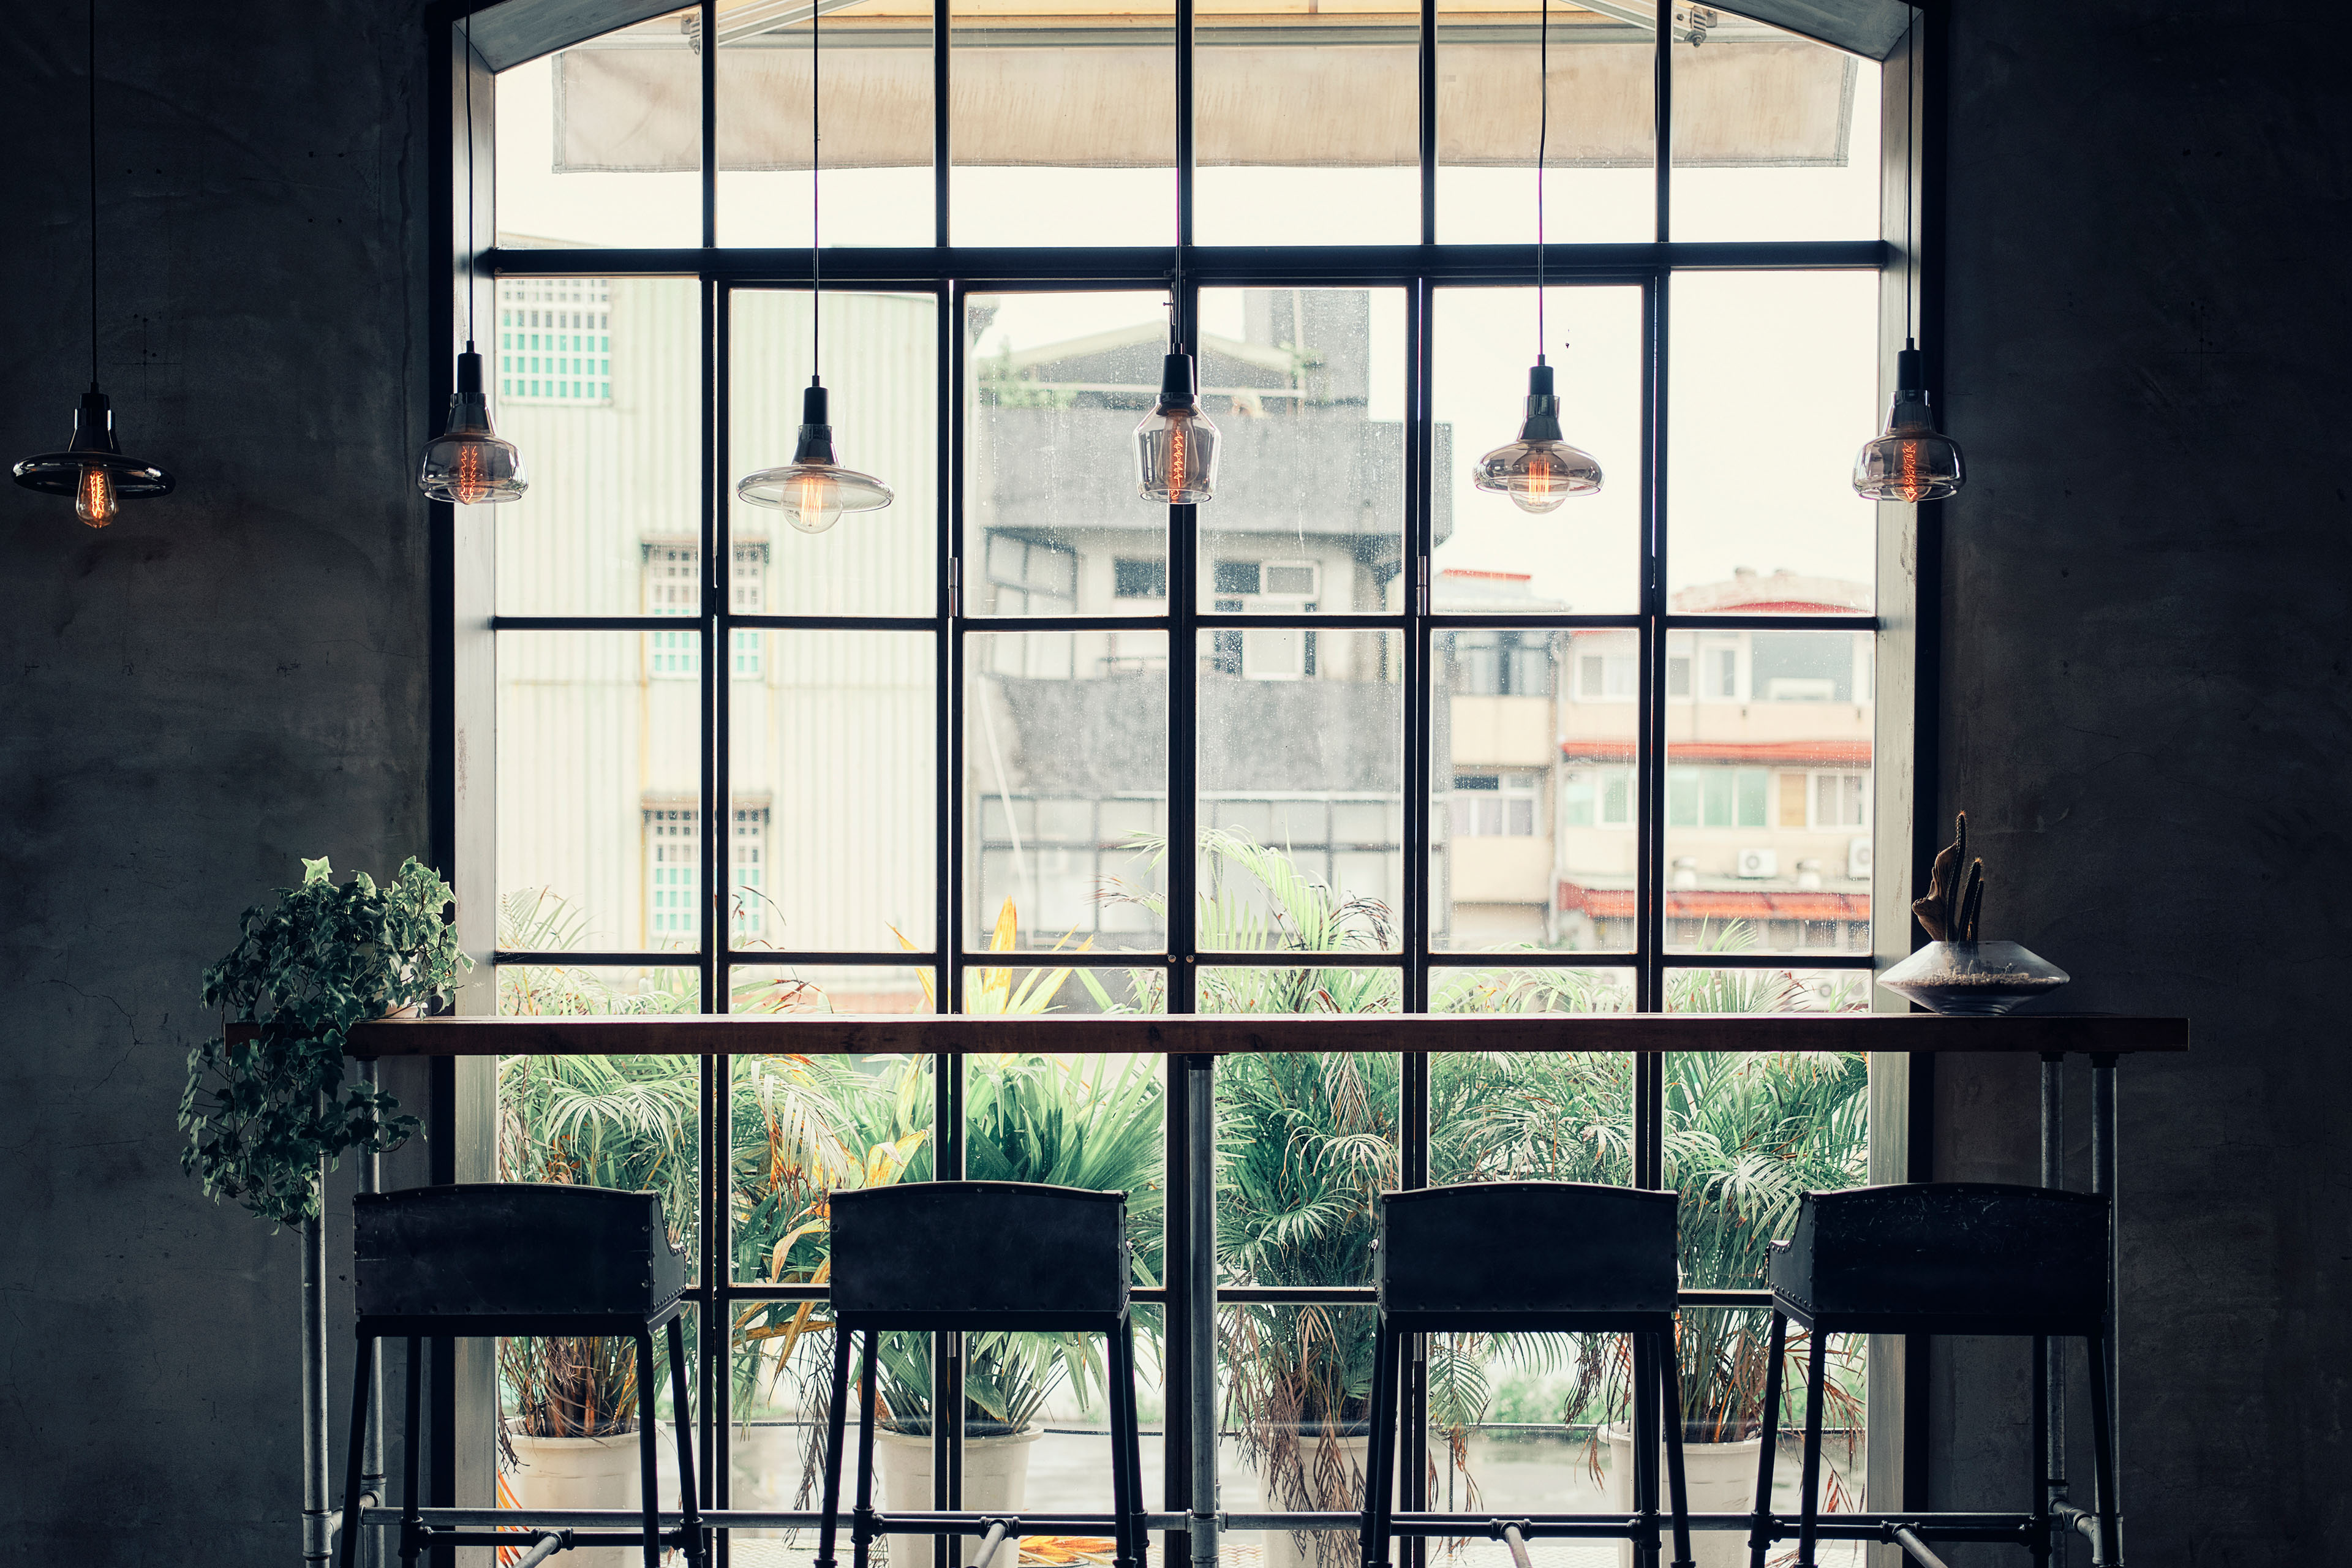 Moderne Besprechungsecke mit Fenster